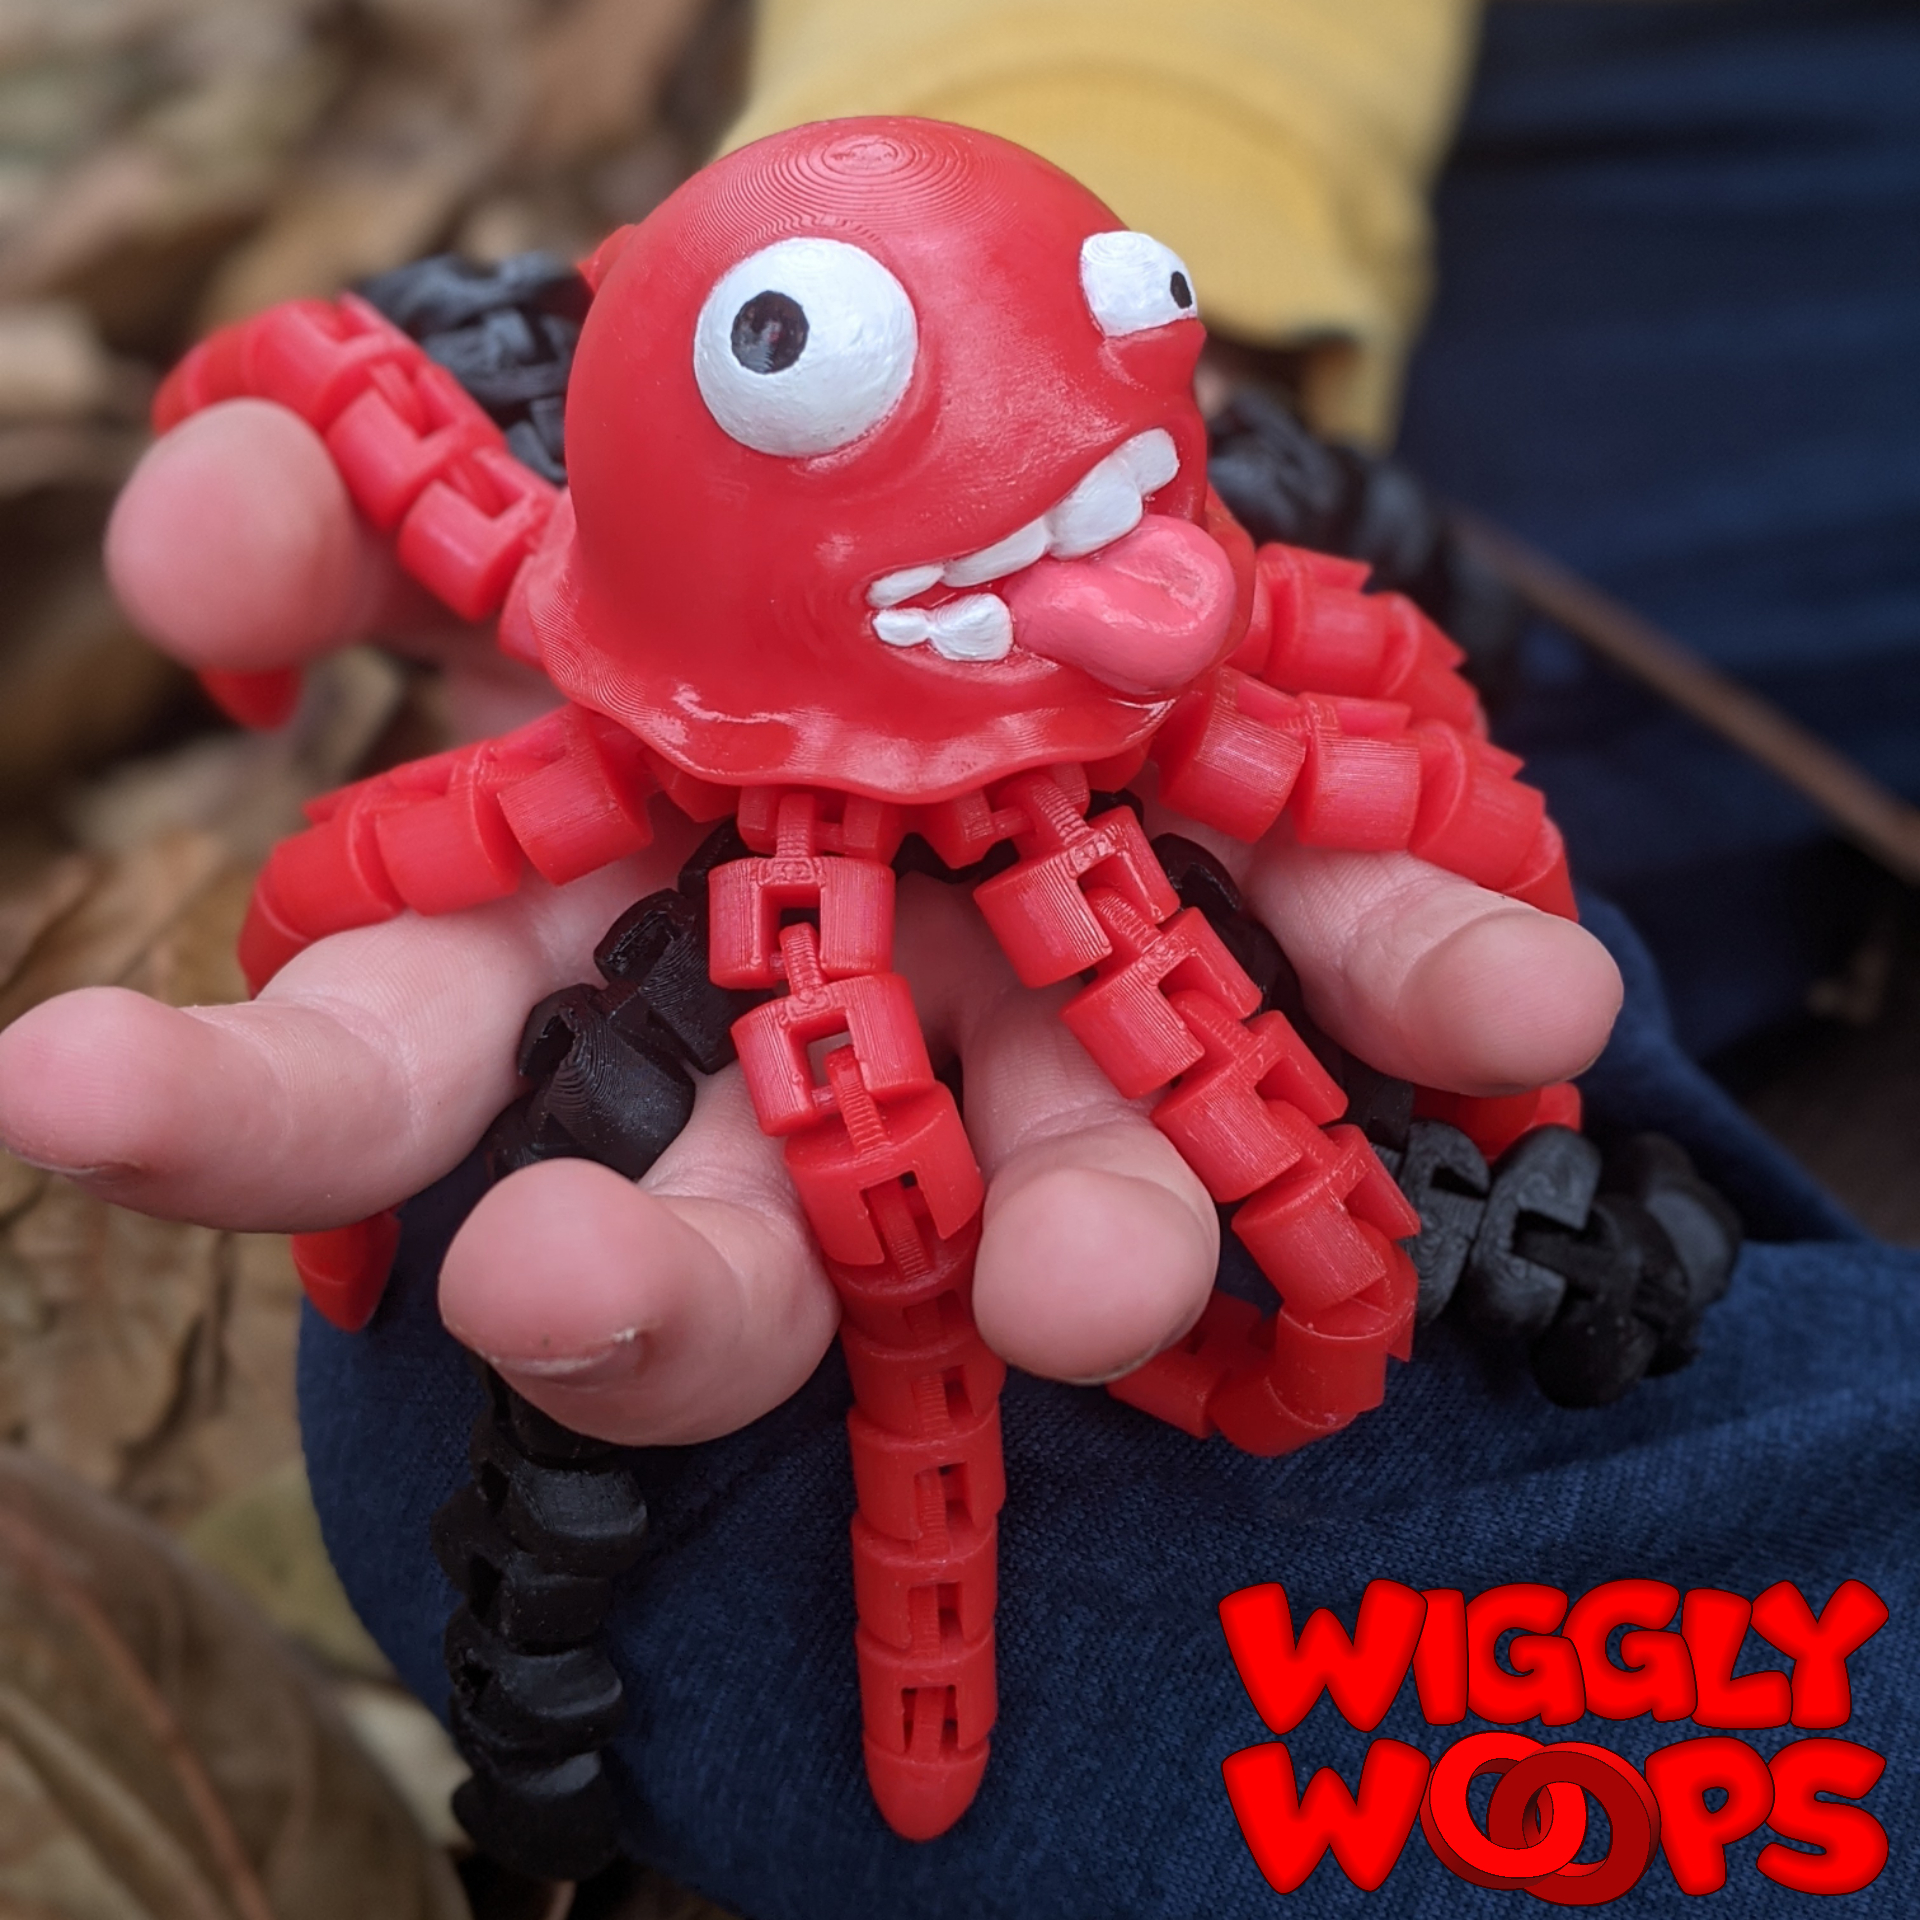 Polish_20201107_105253623.jpg Download STL file Flexi JellyFish • 3D printing model, BirdBott